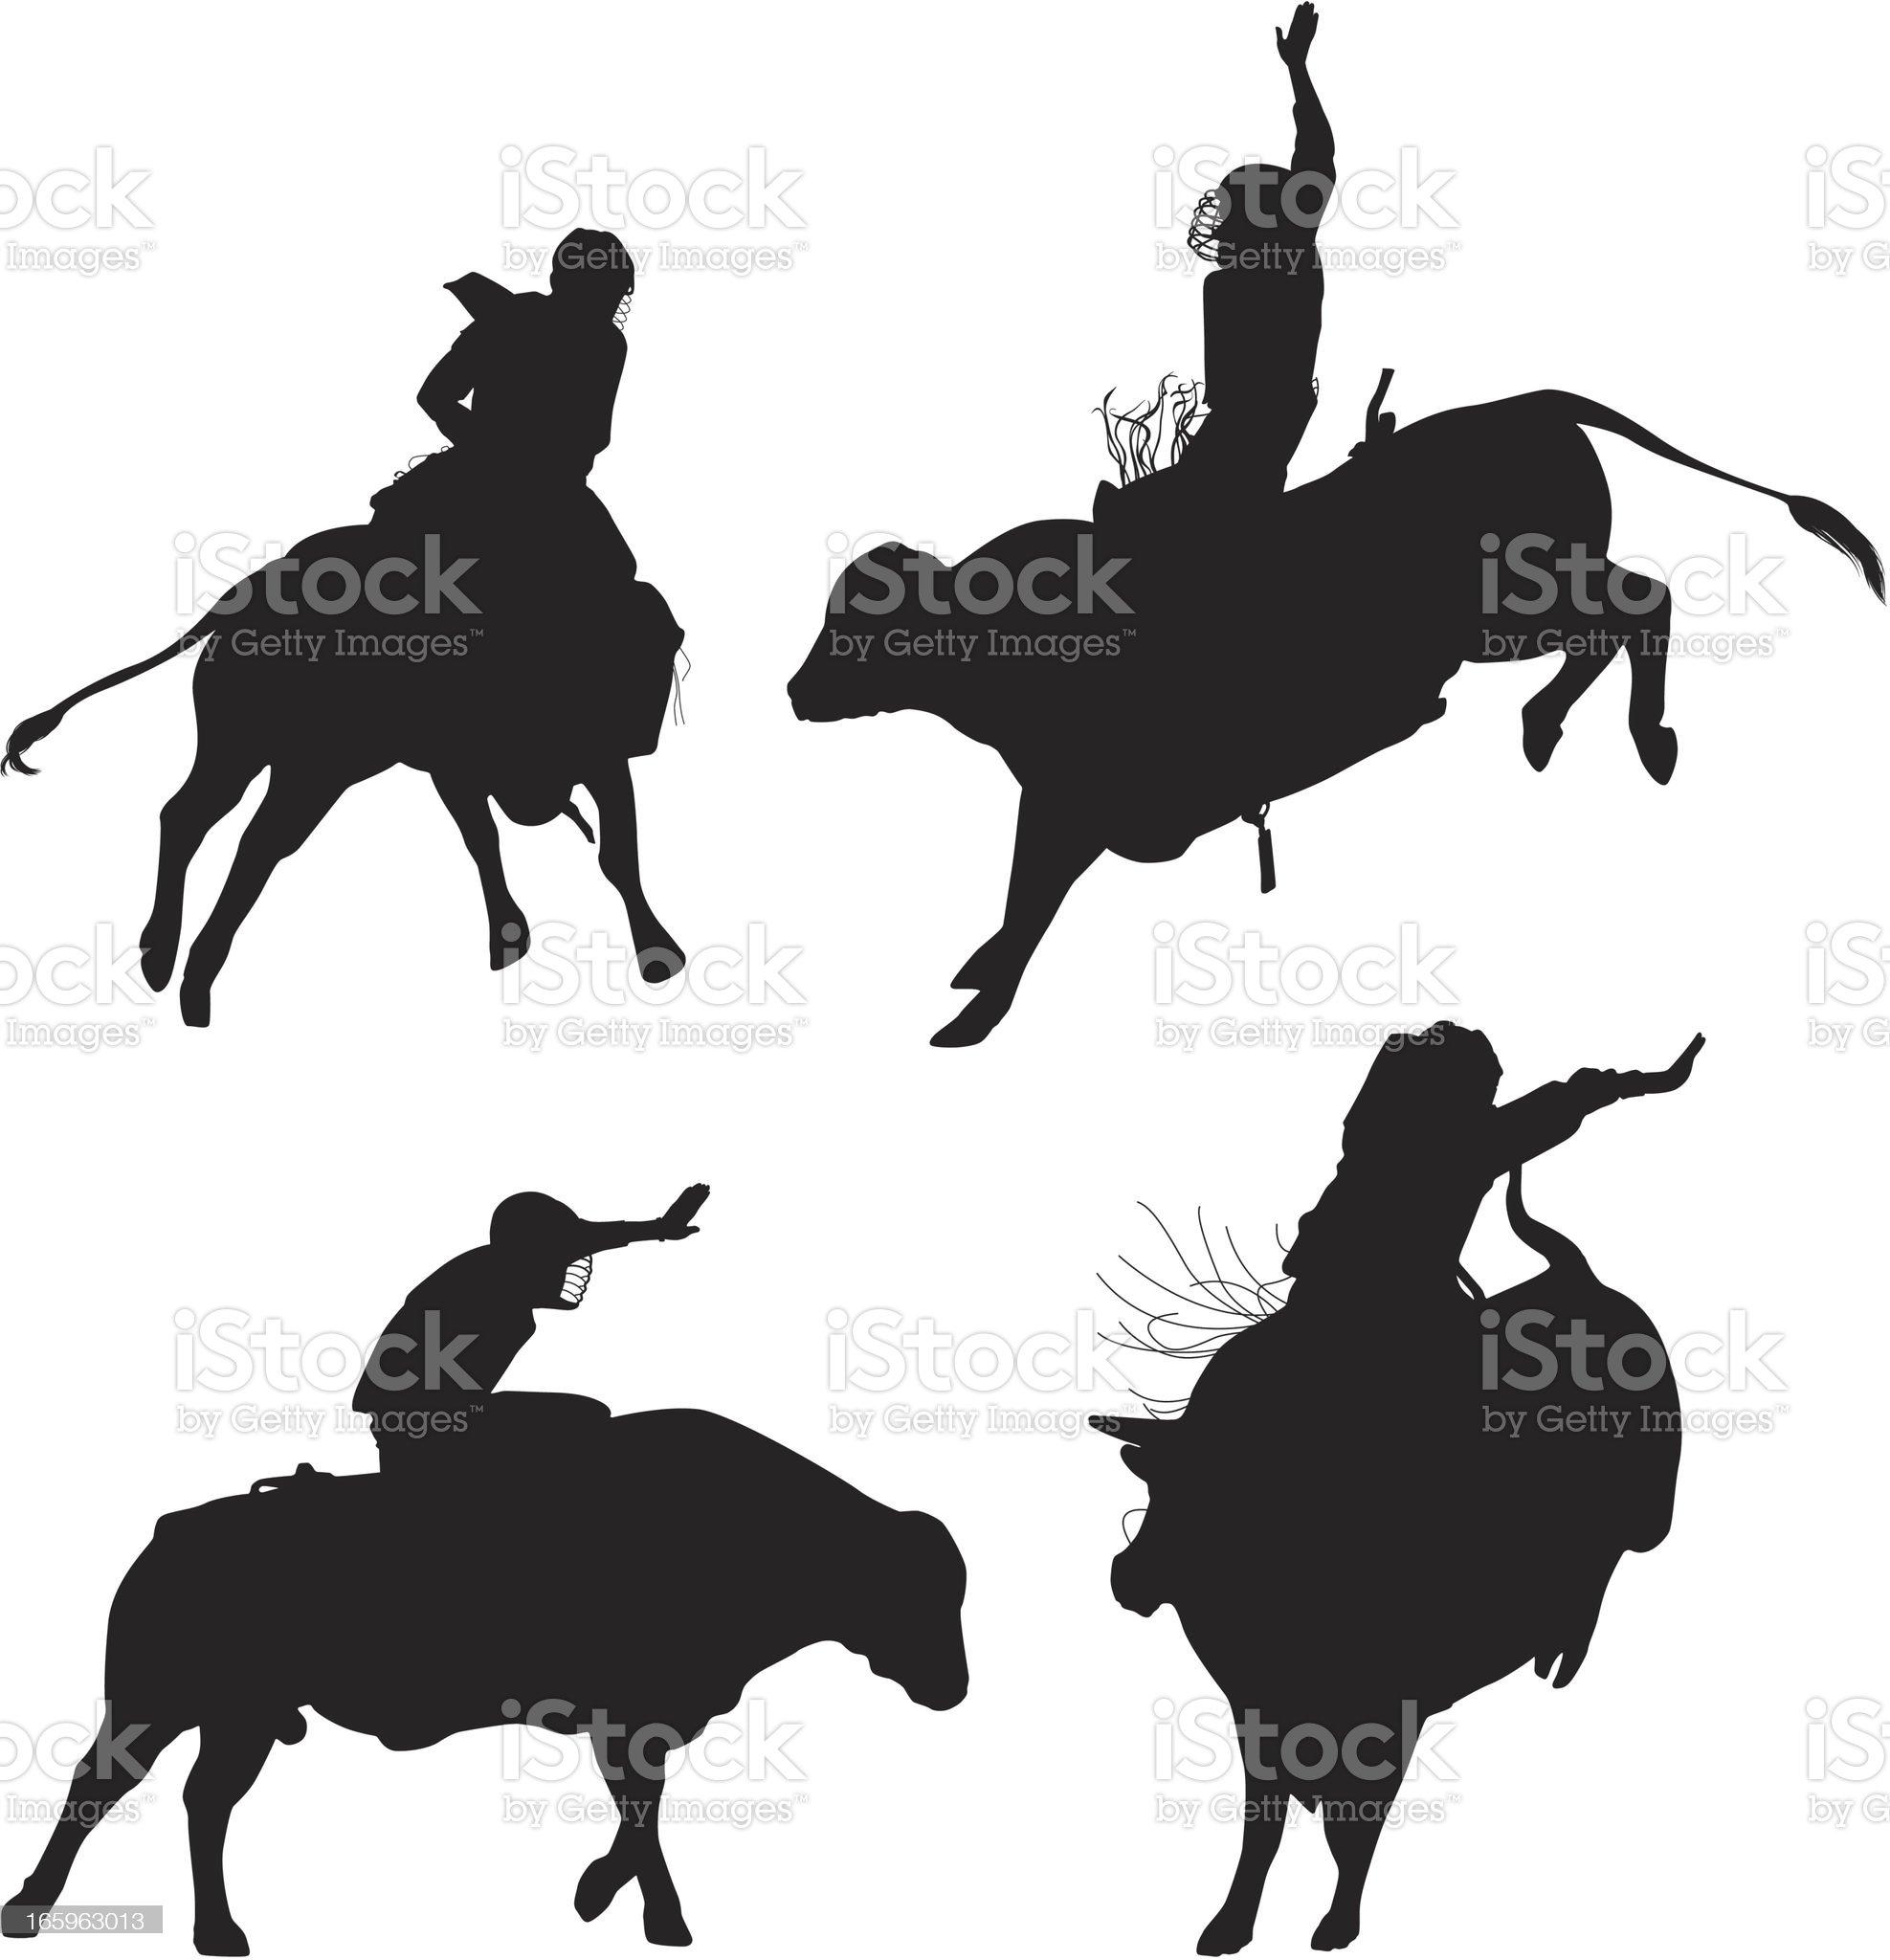 Cowboys riding bulls royalty-free stock vector art